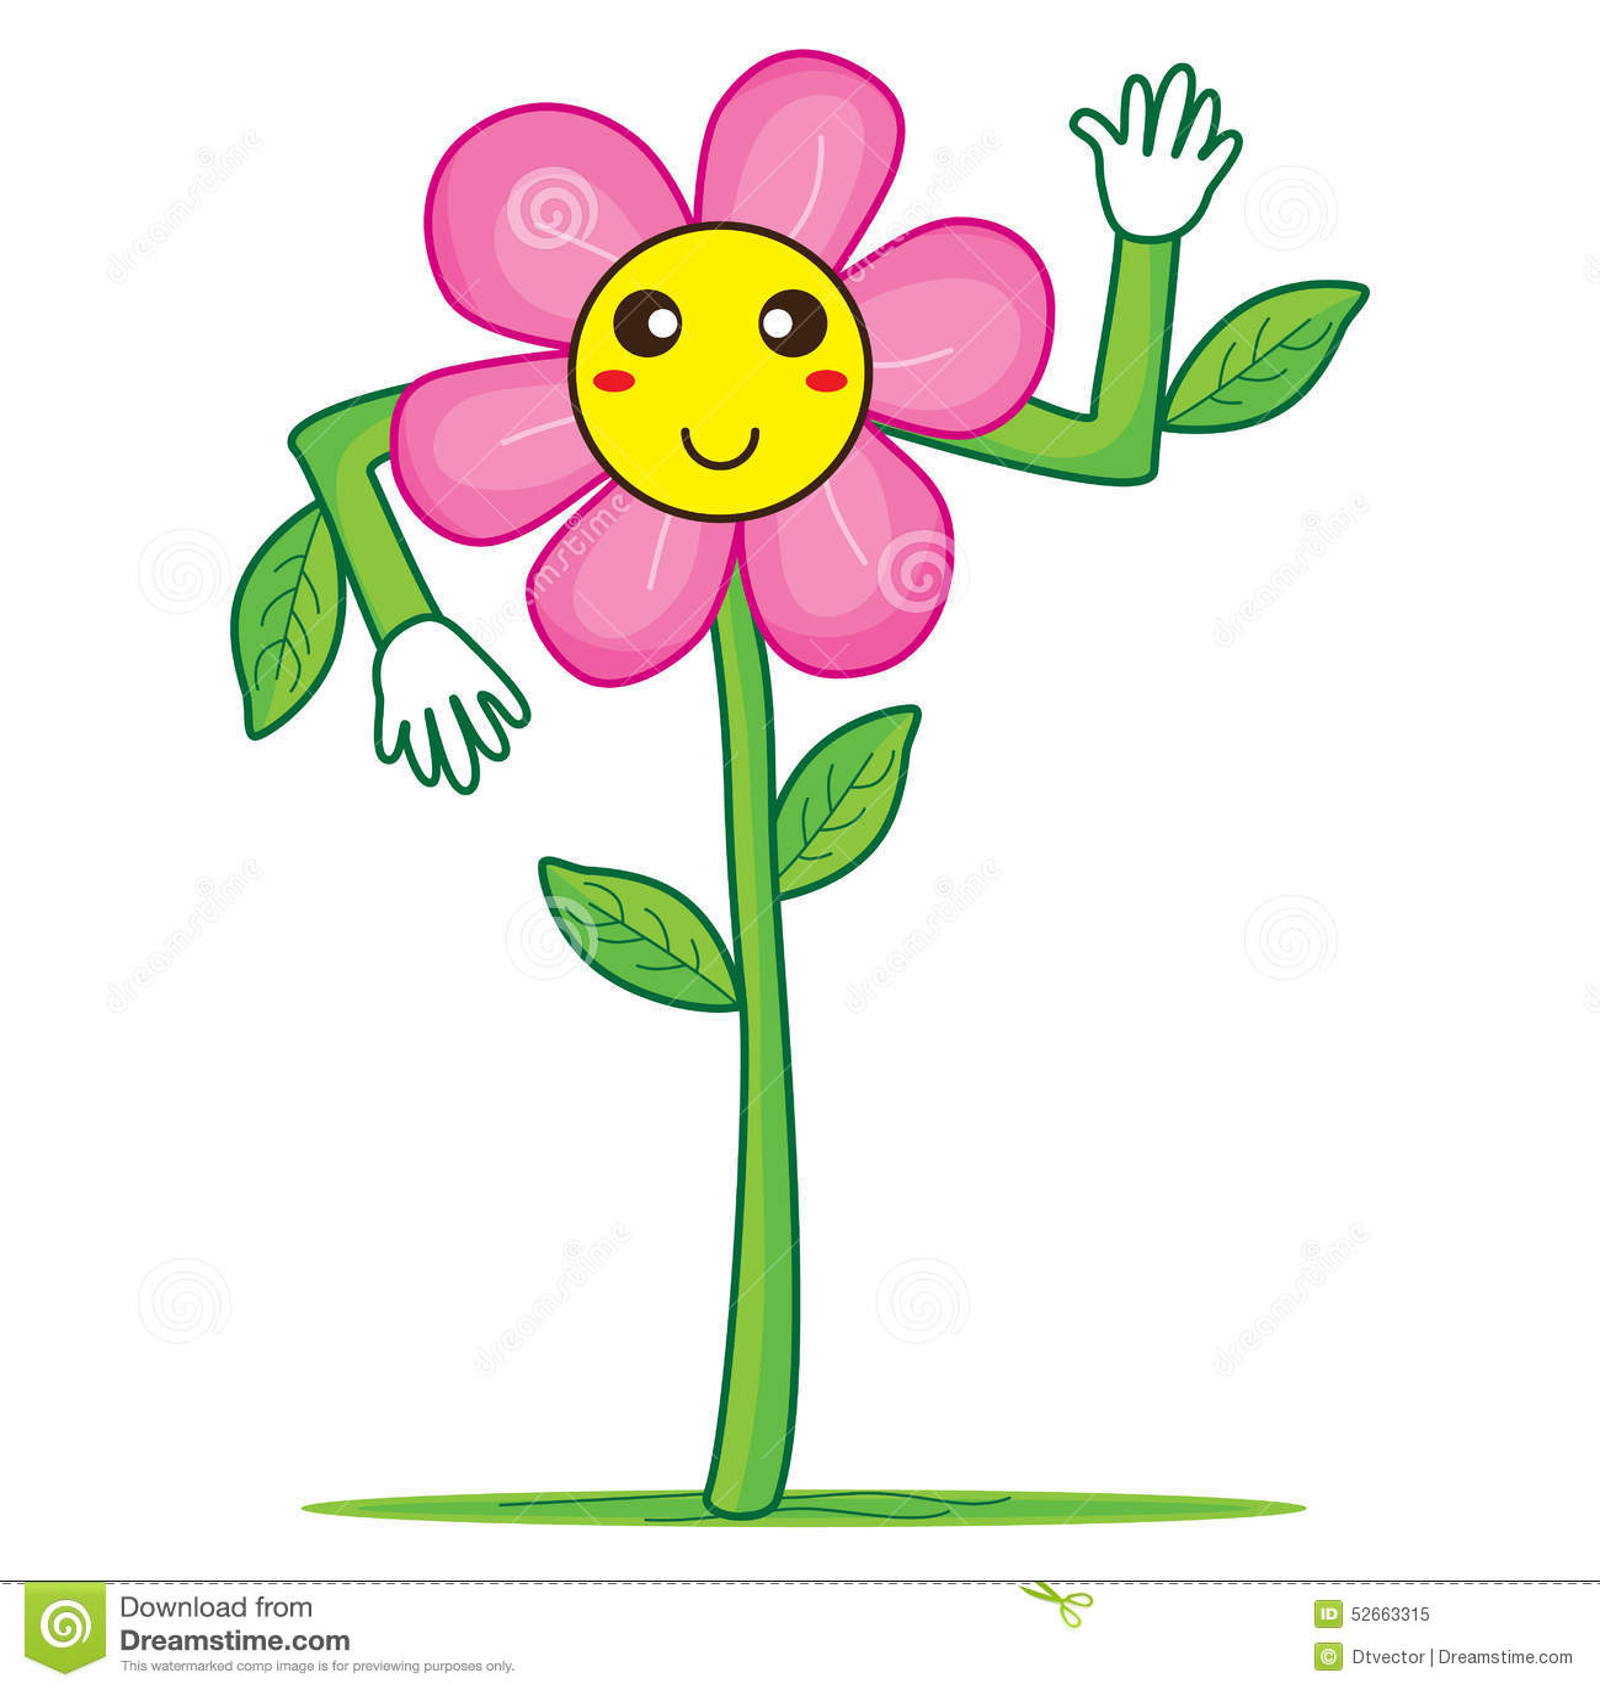 Smiley flower hello